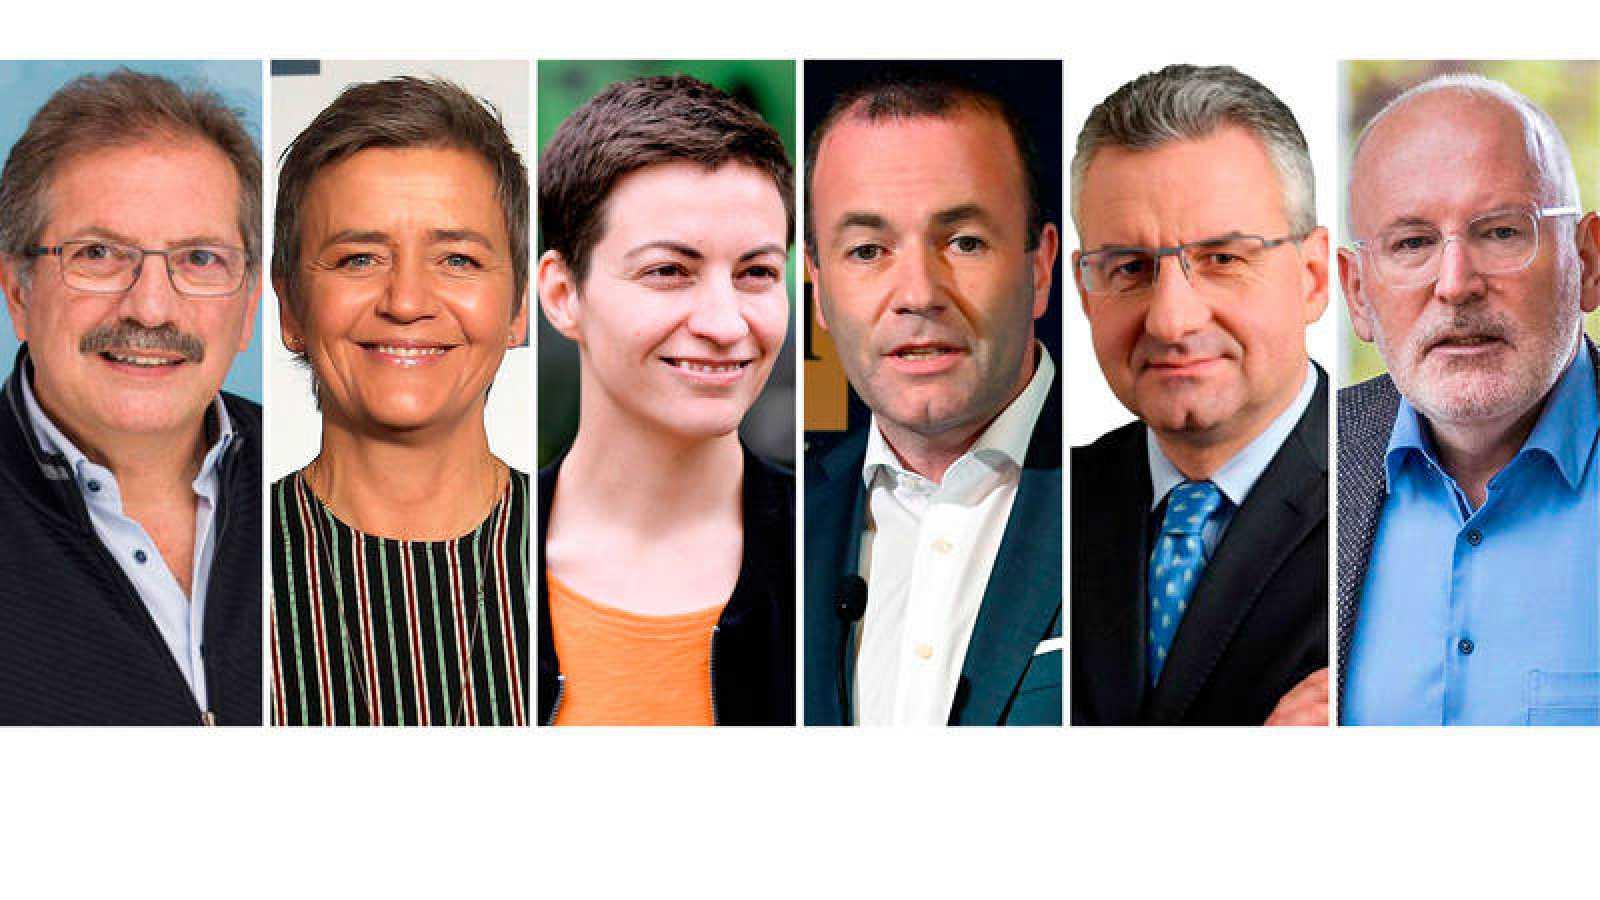 Los seis candidatos a presidir la Comisión Europea: Nico Cué, Margrethe Vestager, Ska Keller, Manfred Weber, Jan Zahradil y Frans Timmermans